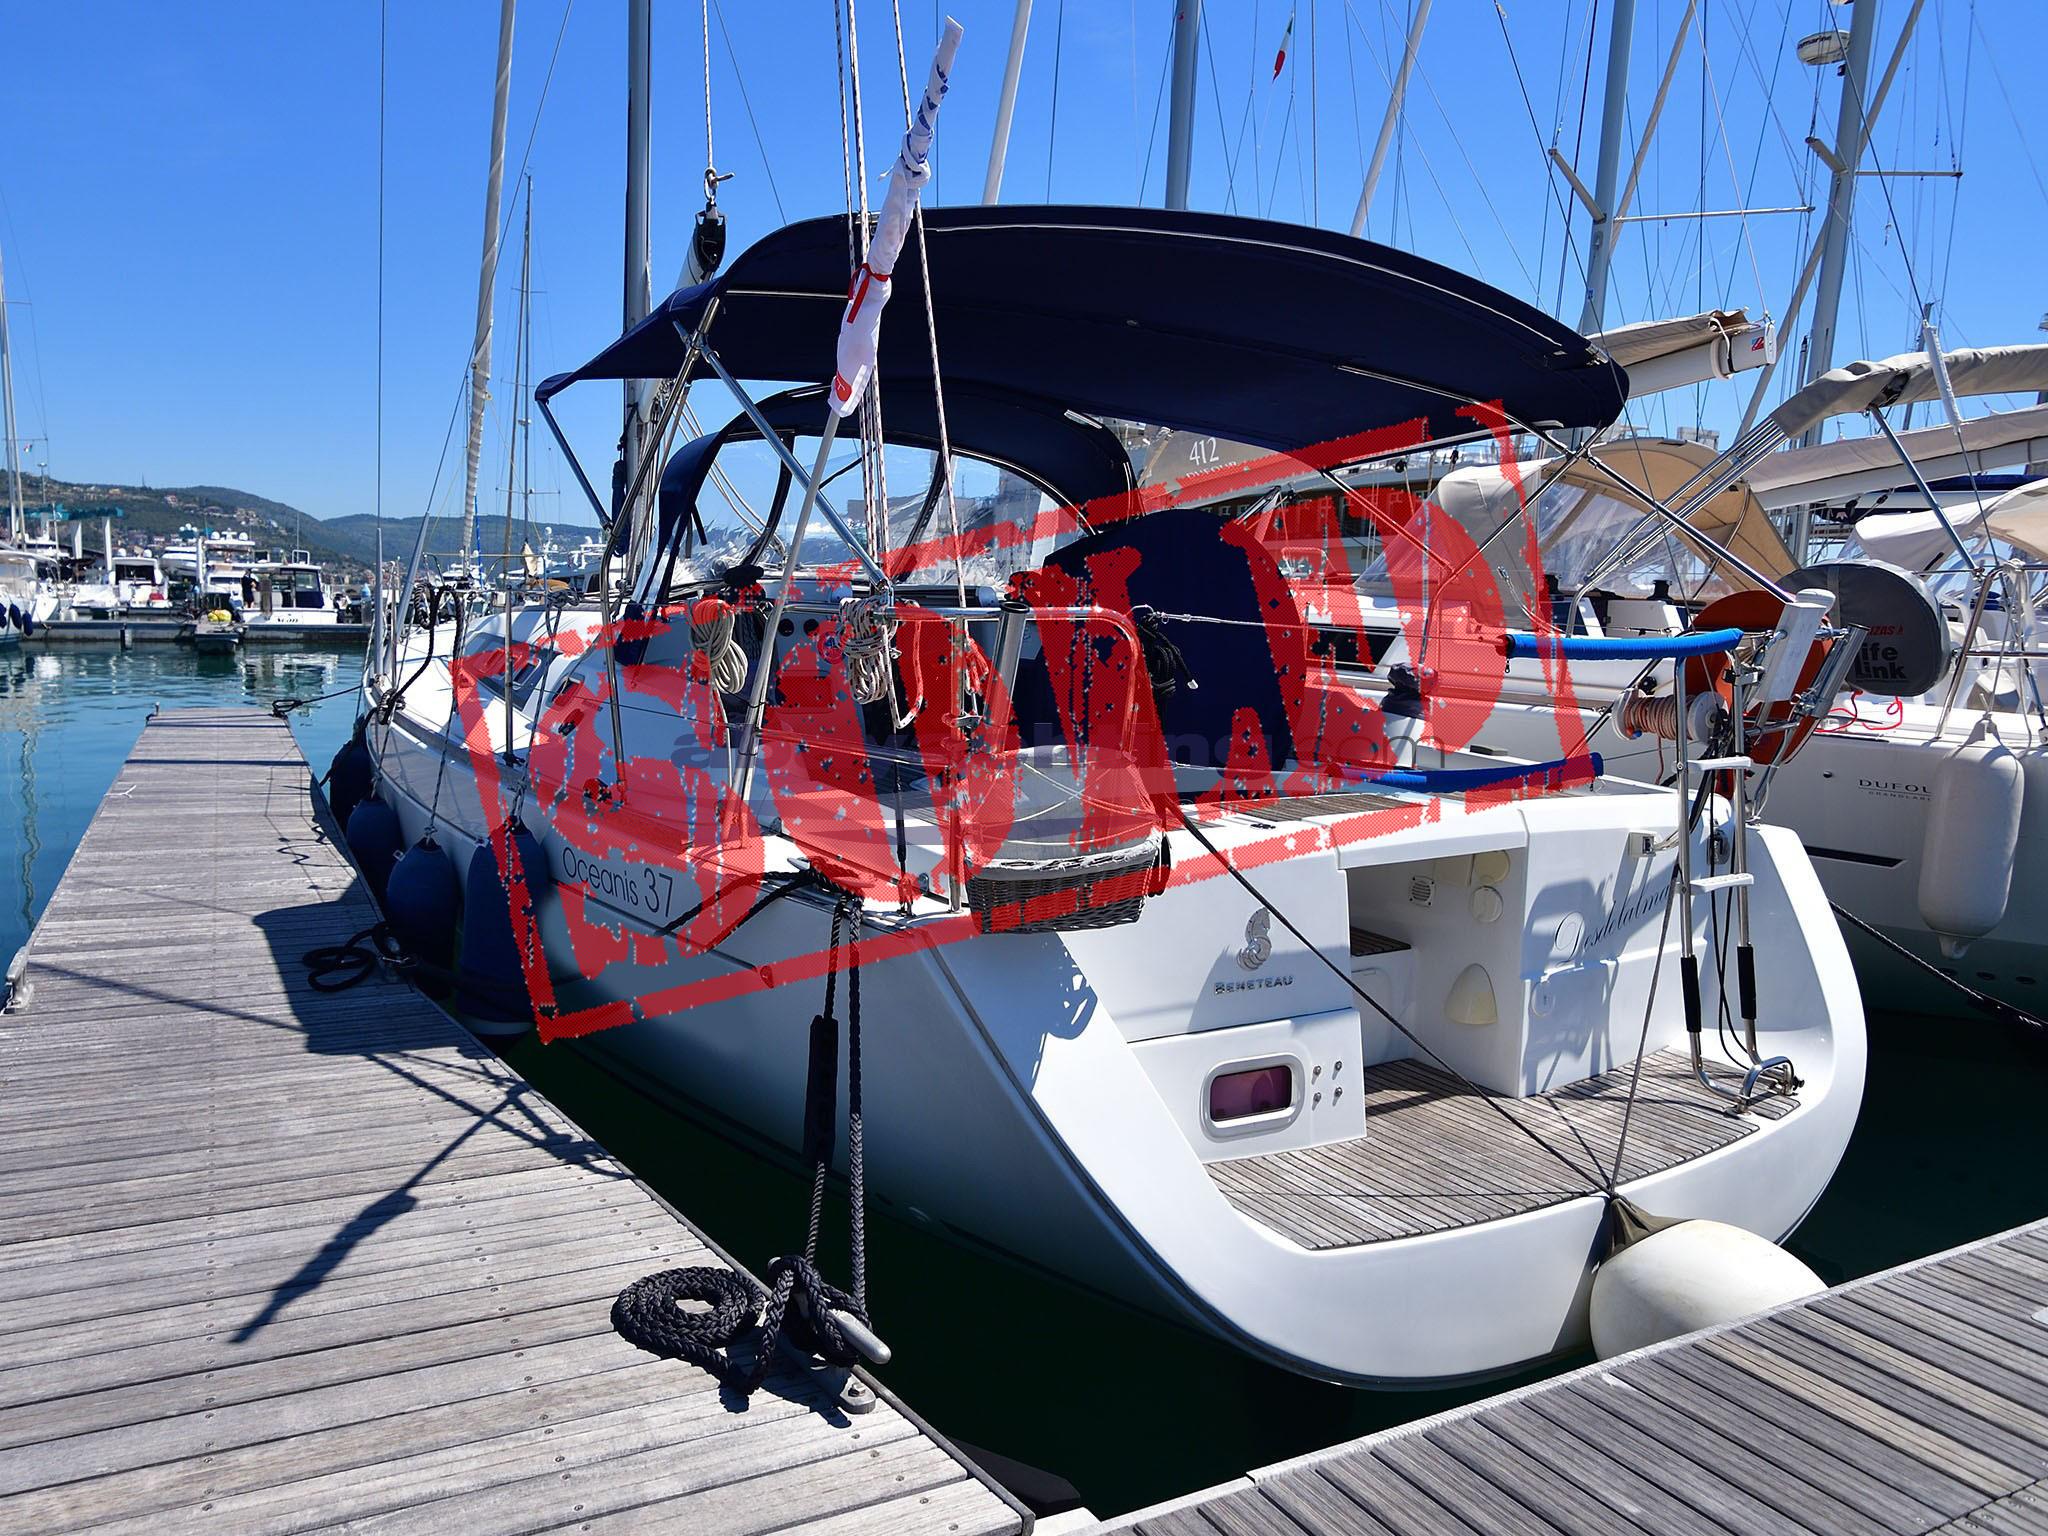 Beneteau Oceanis 37 sold